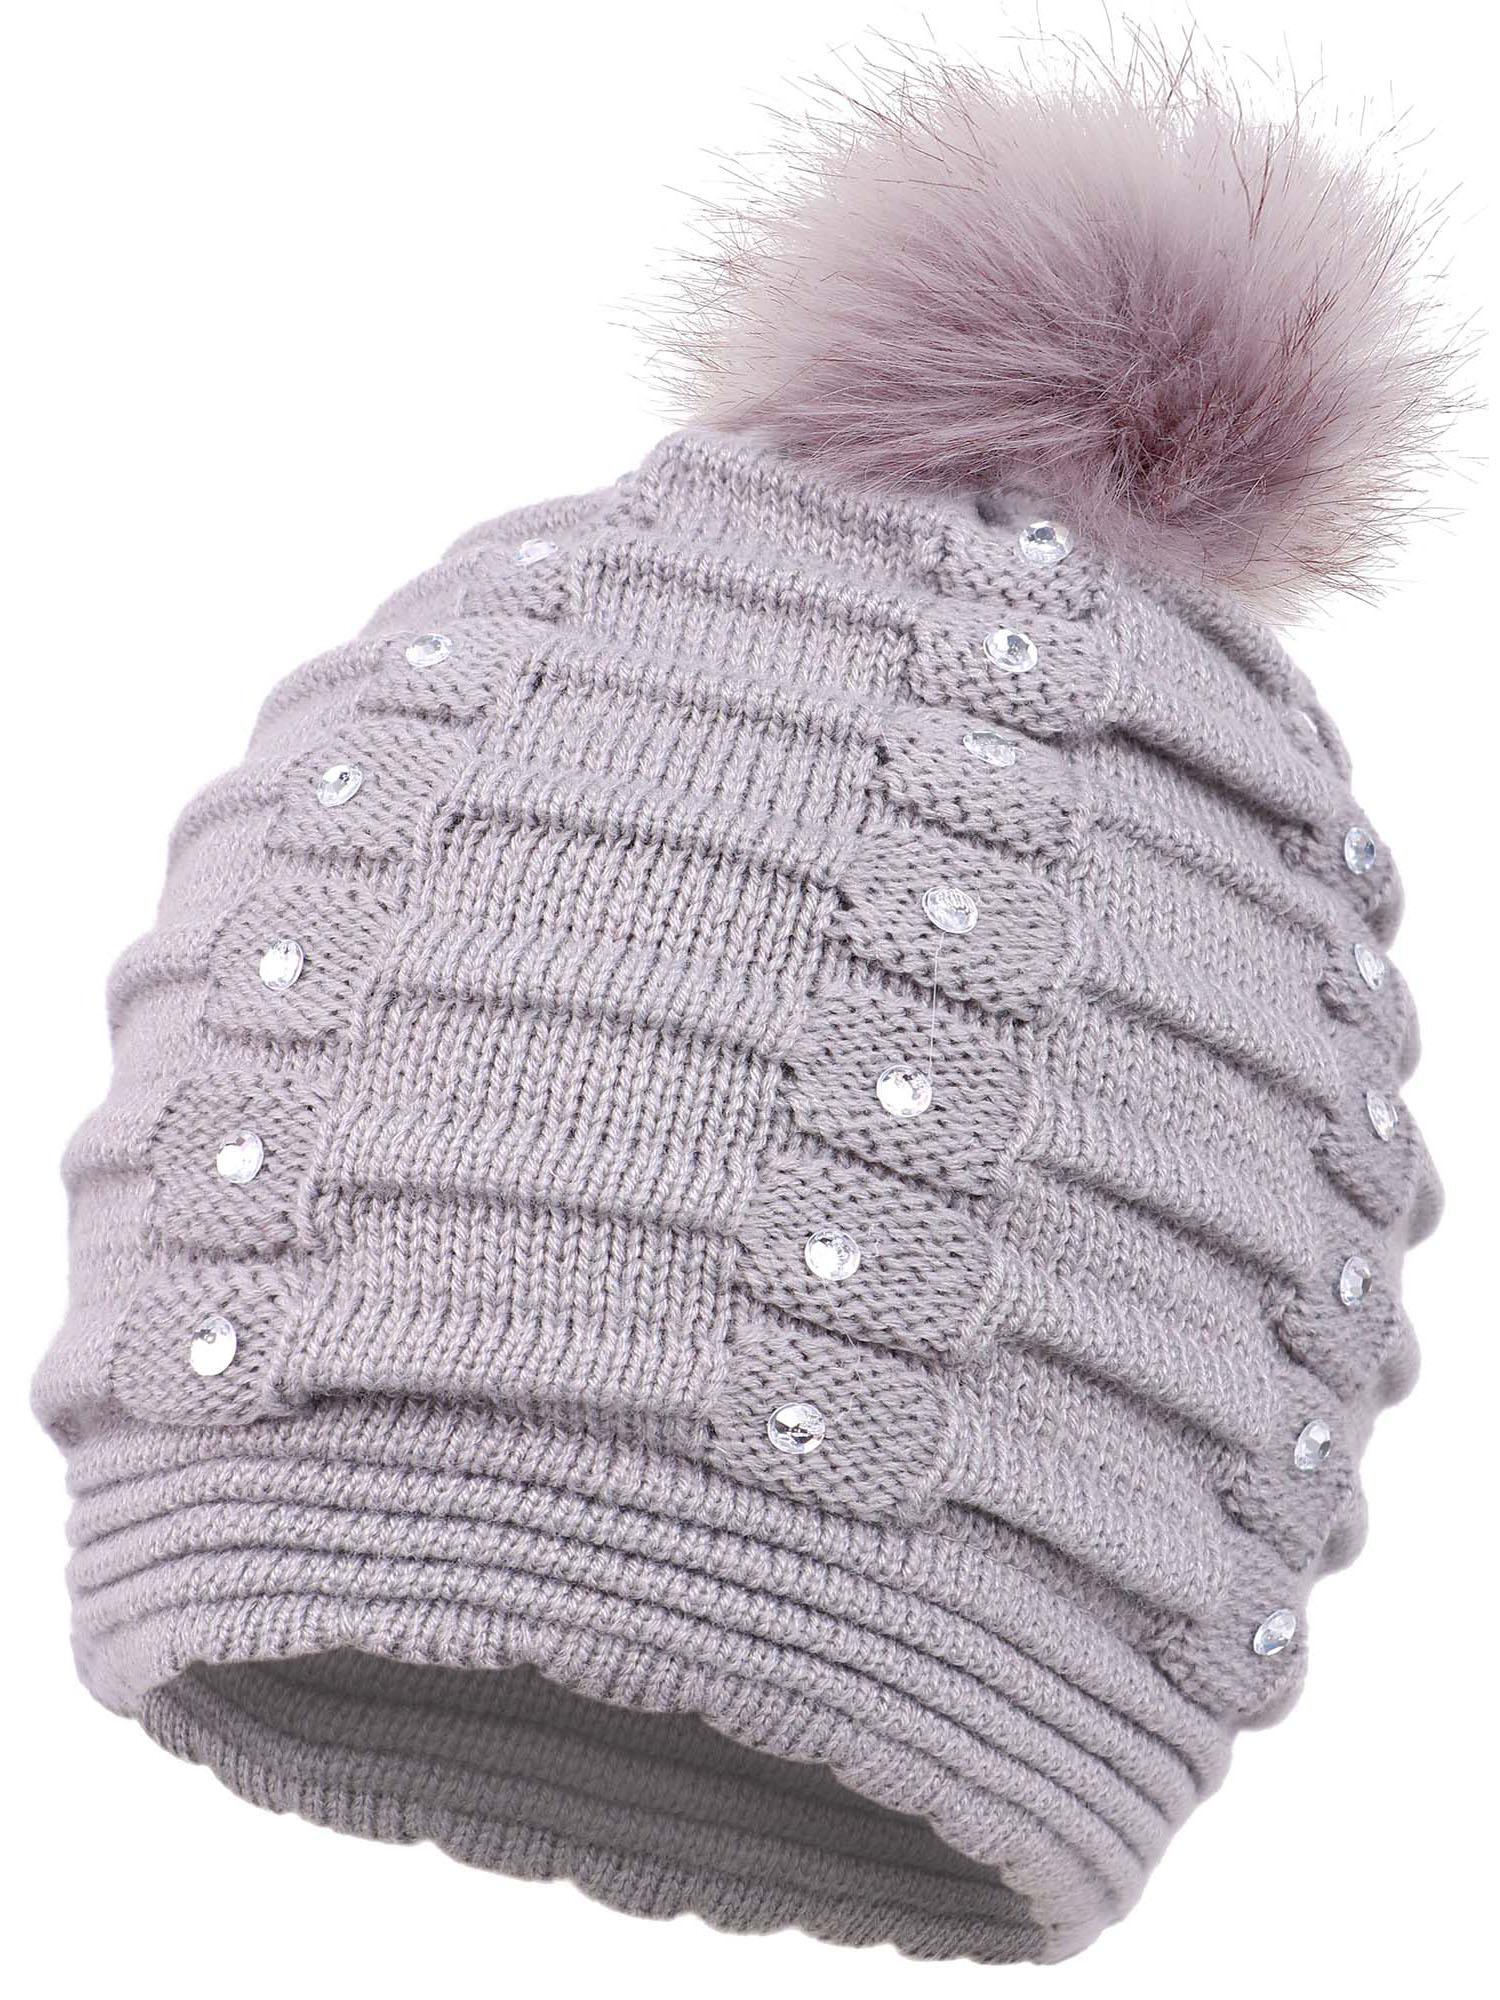 eeb3f2ac7c8 BASILICA - Beanie for Women Winter Warm Knitted Sequins Pompom Beanie Hat  Grey - Walmart.com